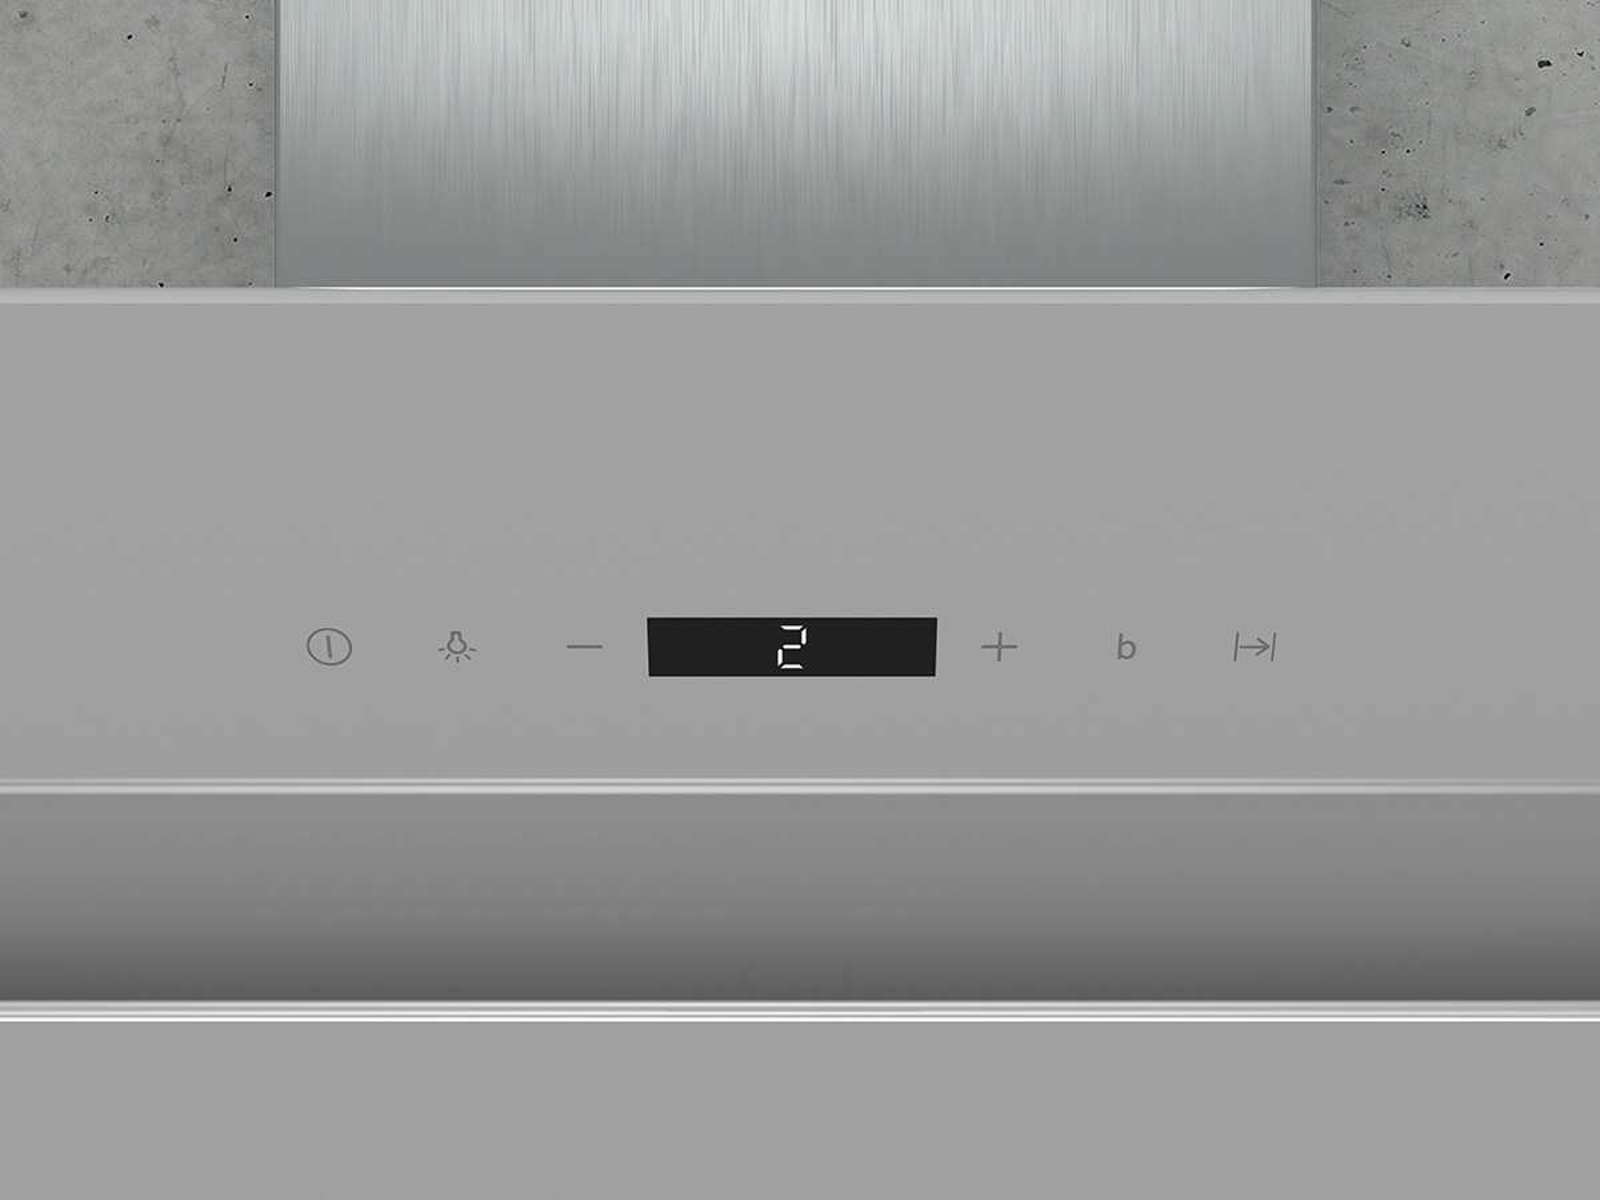 Siemens lc klp kopffreihaube silber